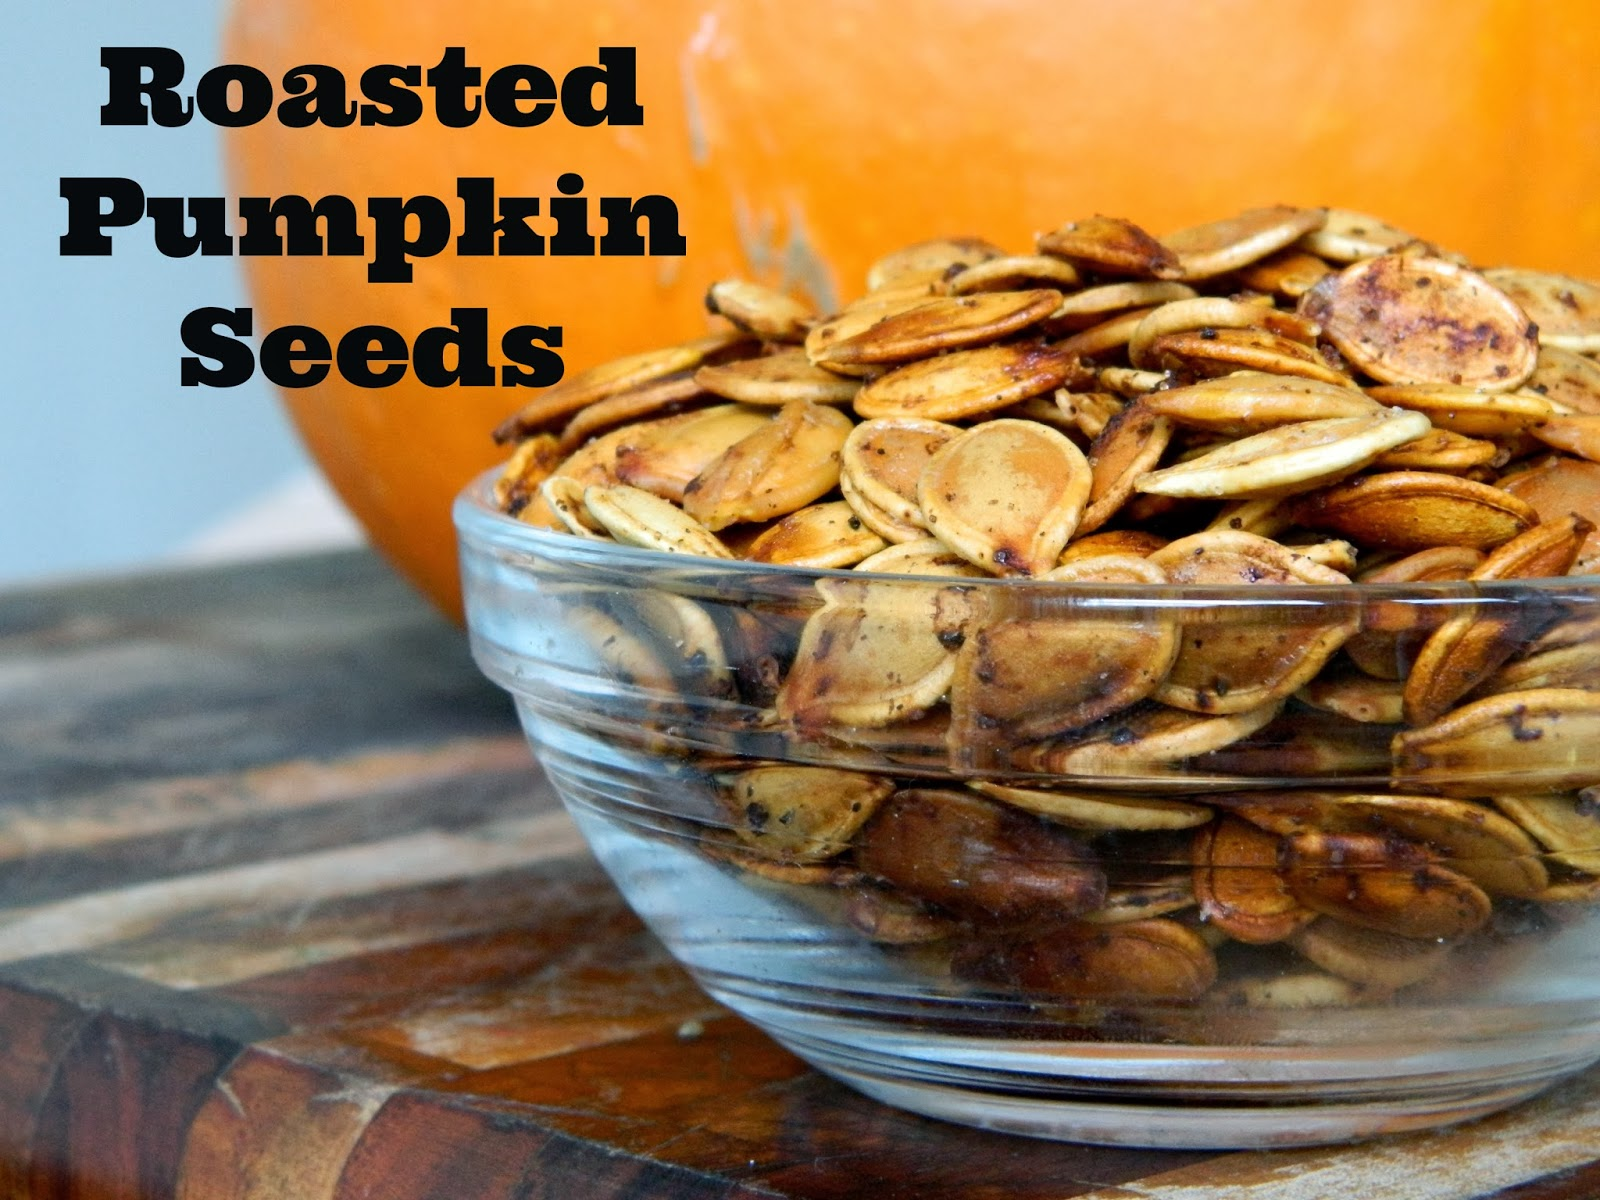 southern bliss blog}: {Roasted Pumpkin Seeds}